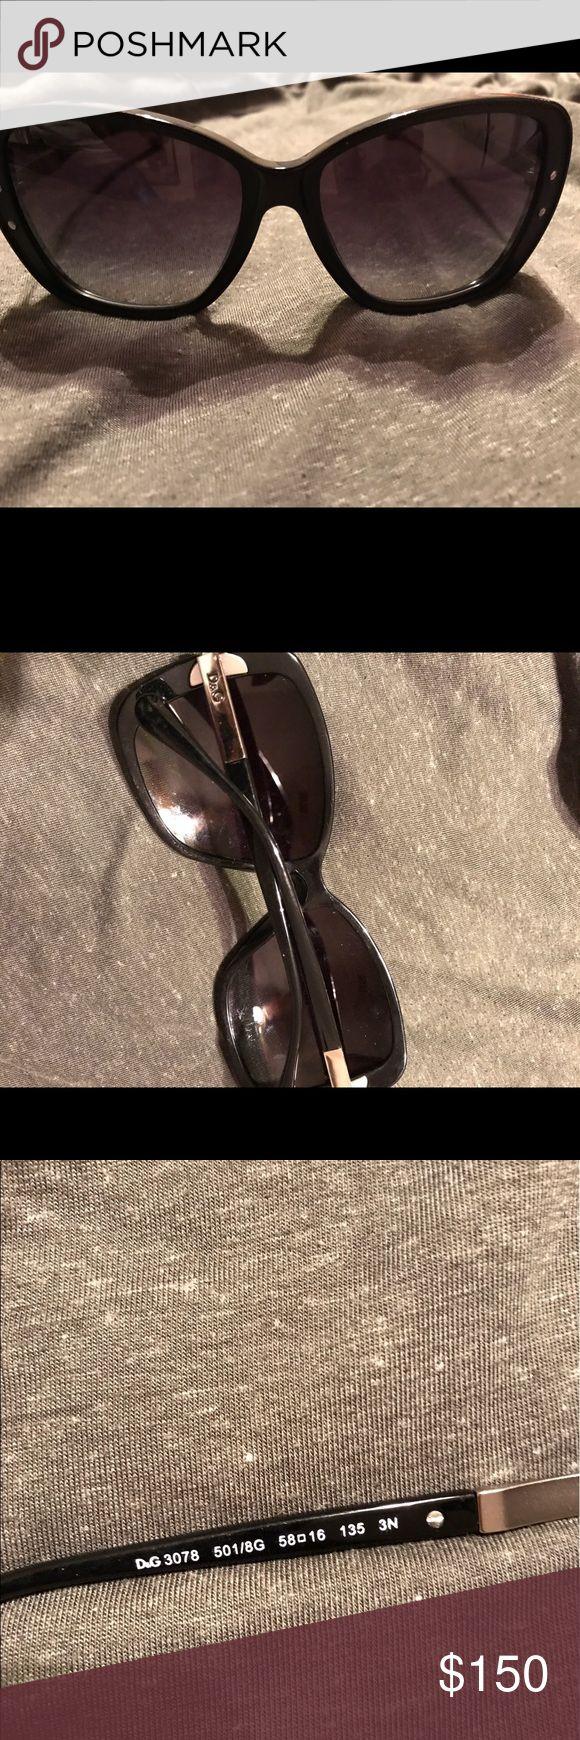 D&G Cat Eye Silhouette sunglasses Perfect condition  Dolce & Gabbana Accessories Sunglasses